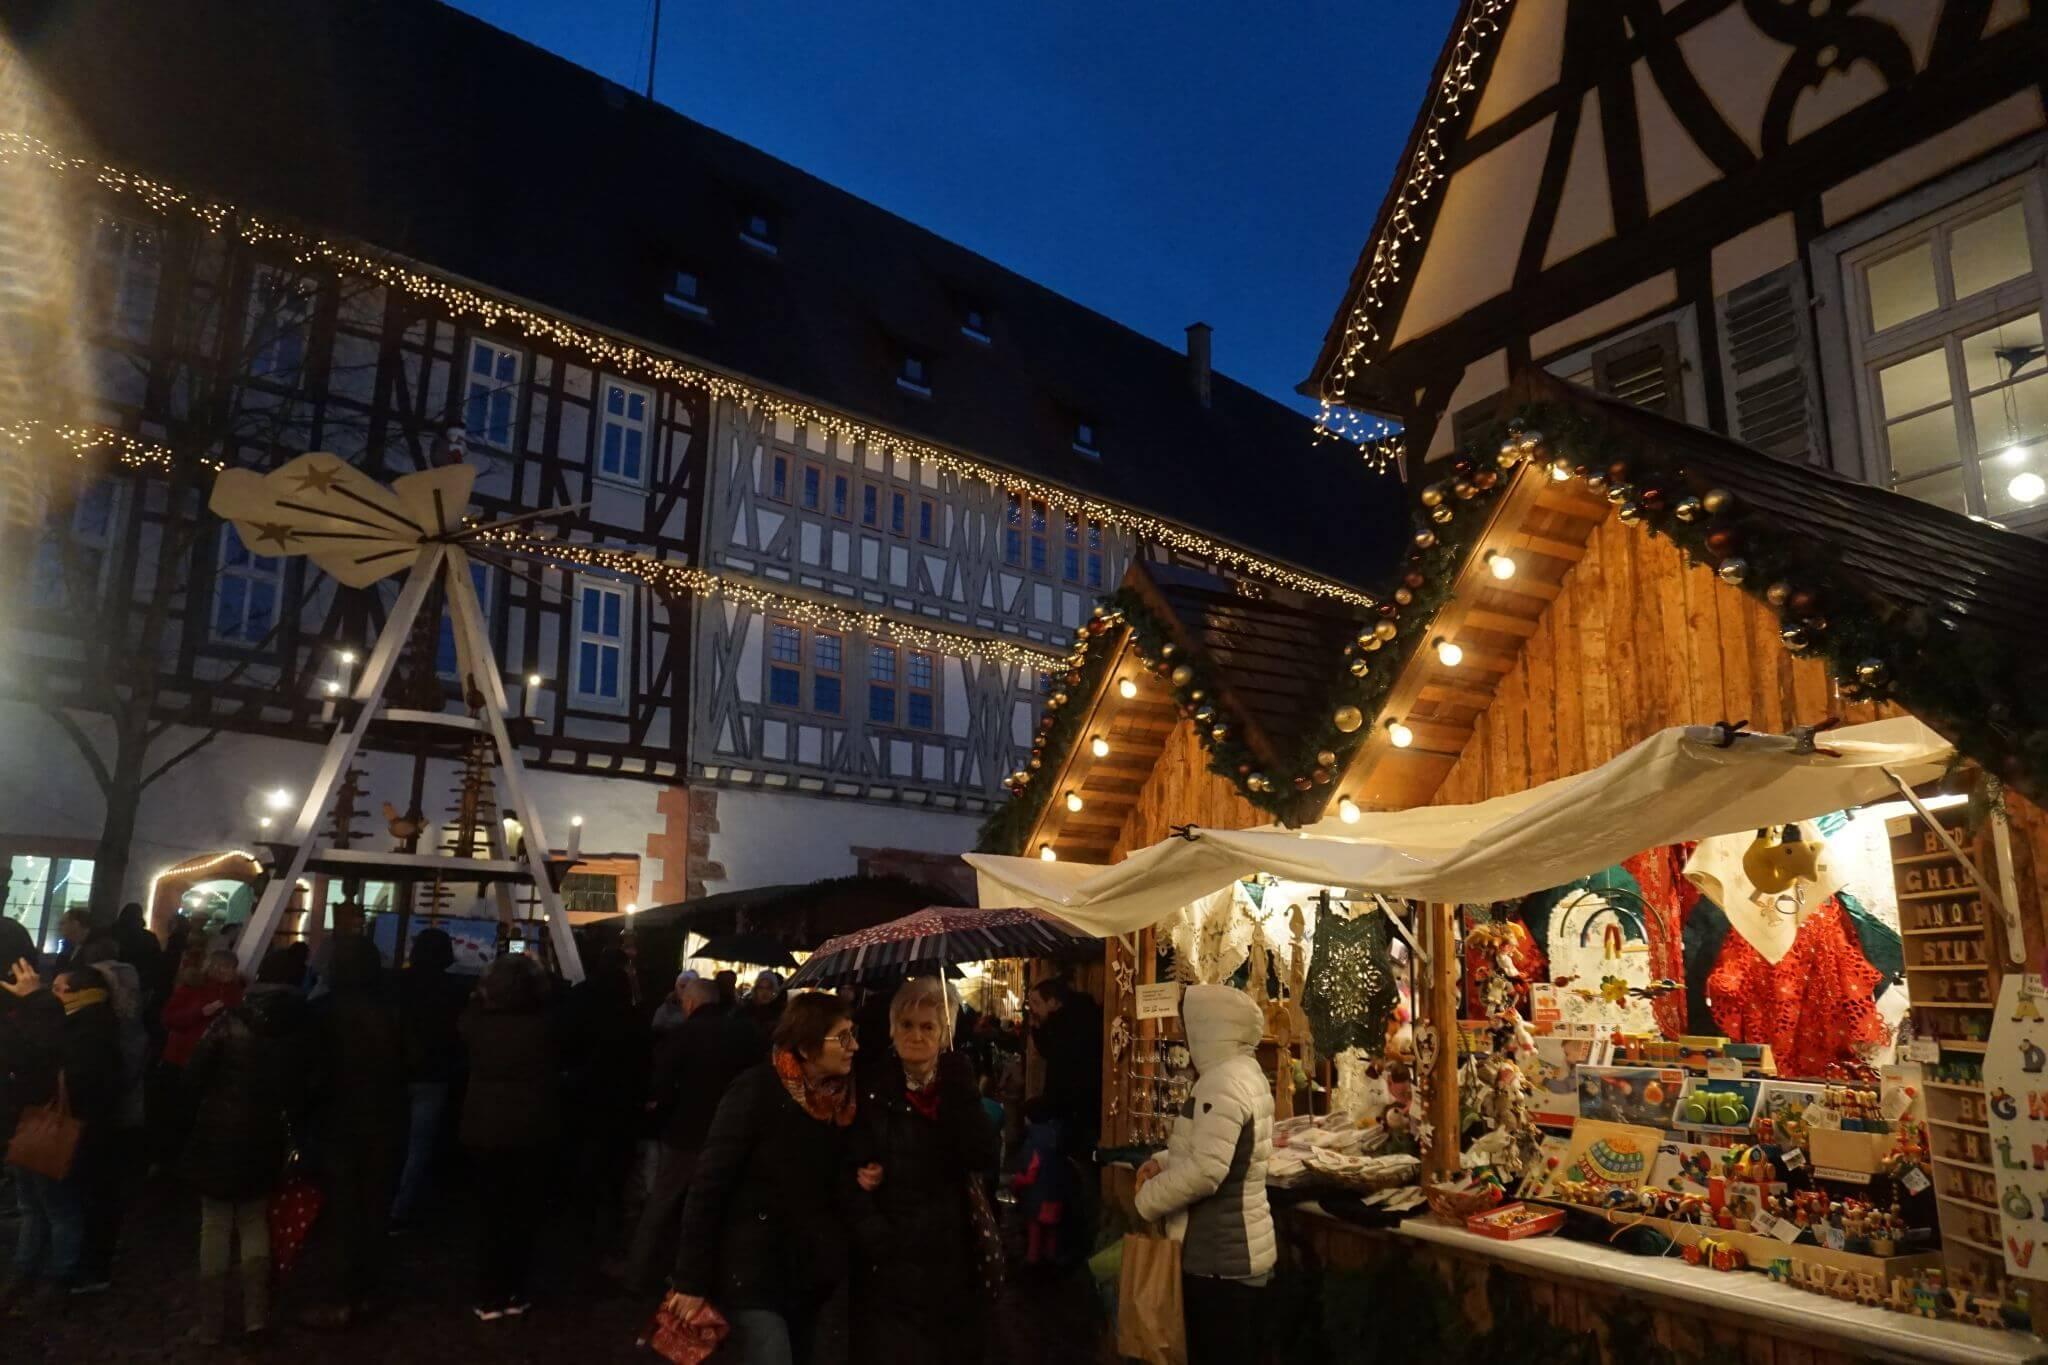 De compras navideñas en Michelstädt